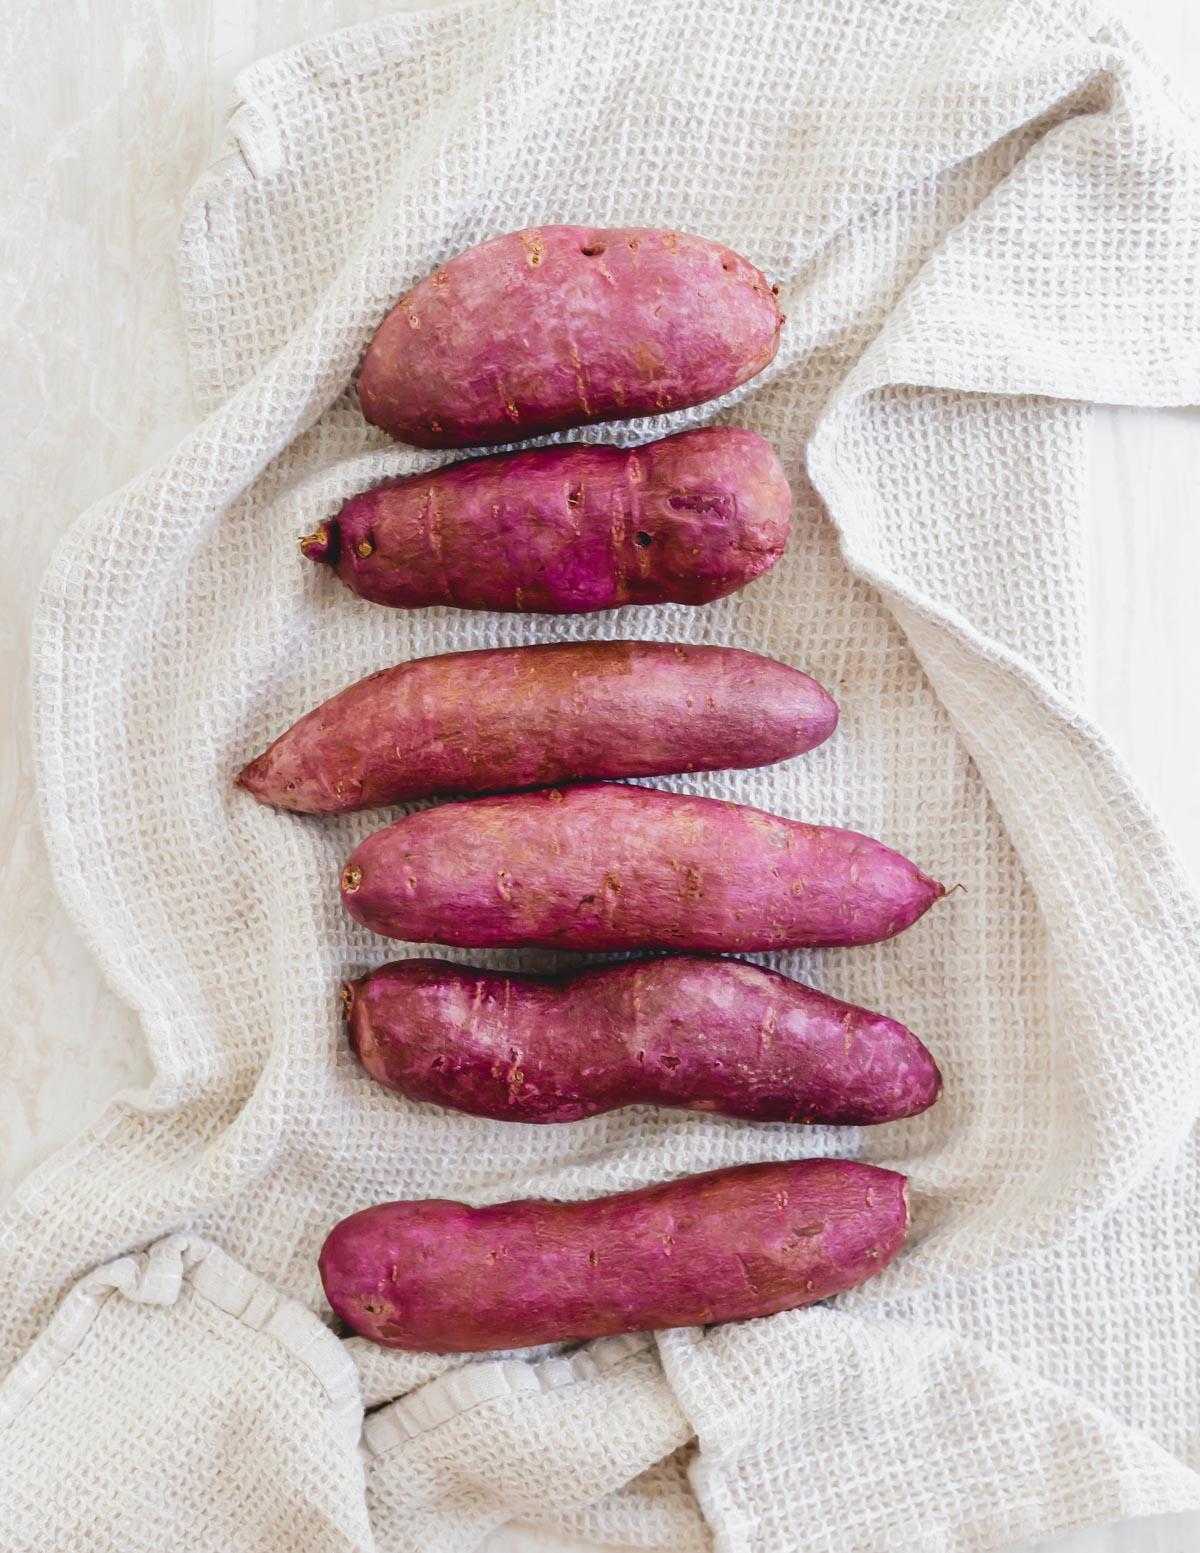 Stokes purple sweet potatoes on a kitchen towel.